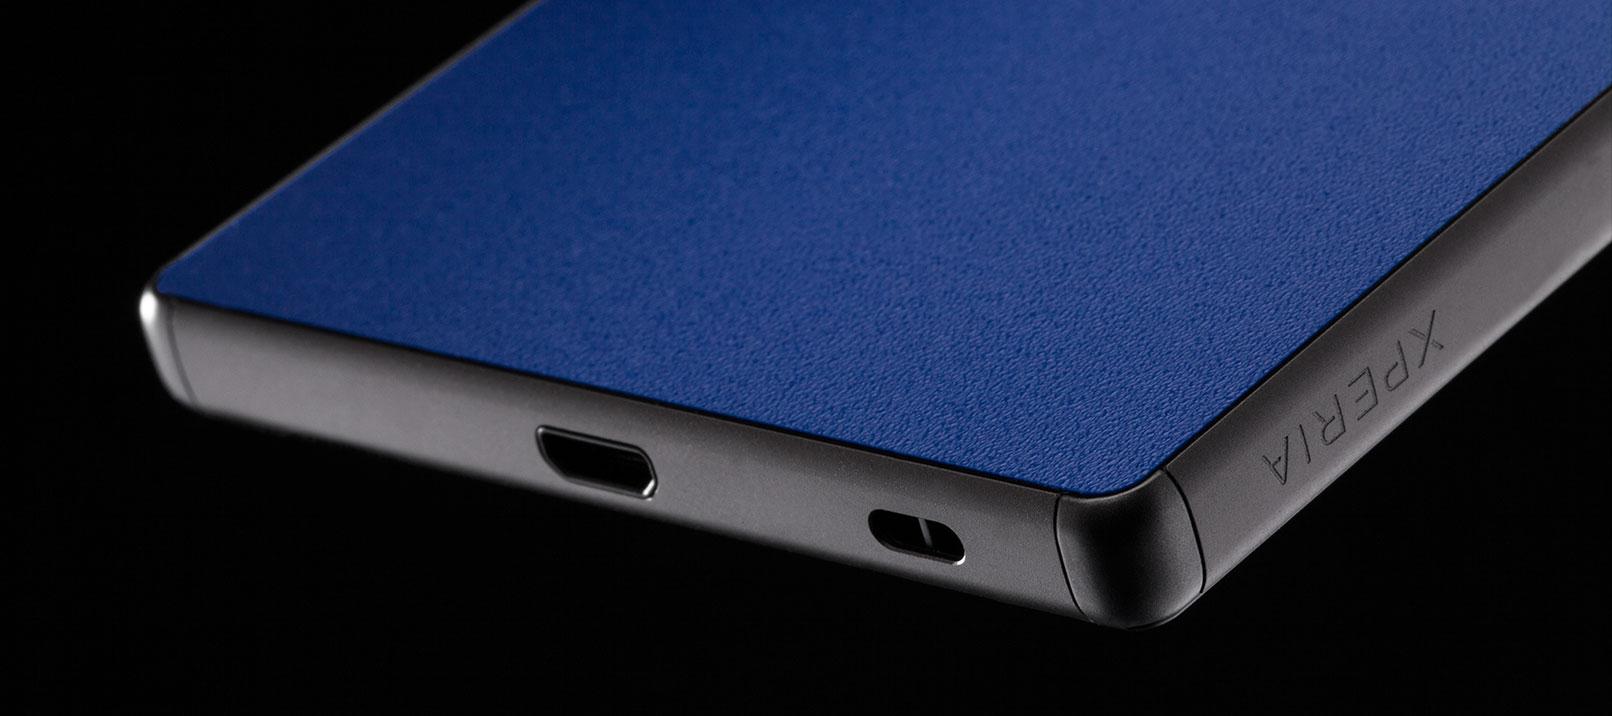 Sony Xperia Z5 Root Status